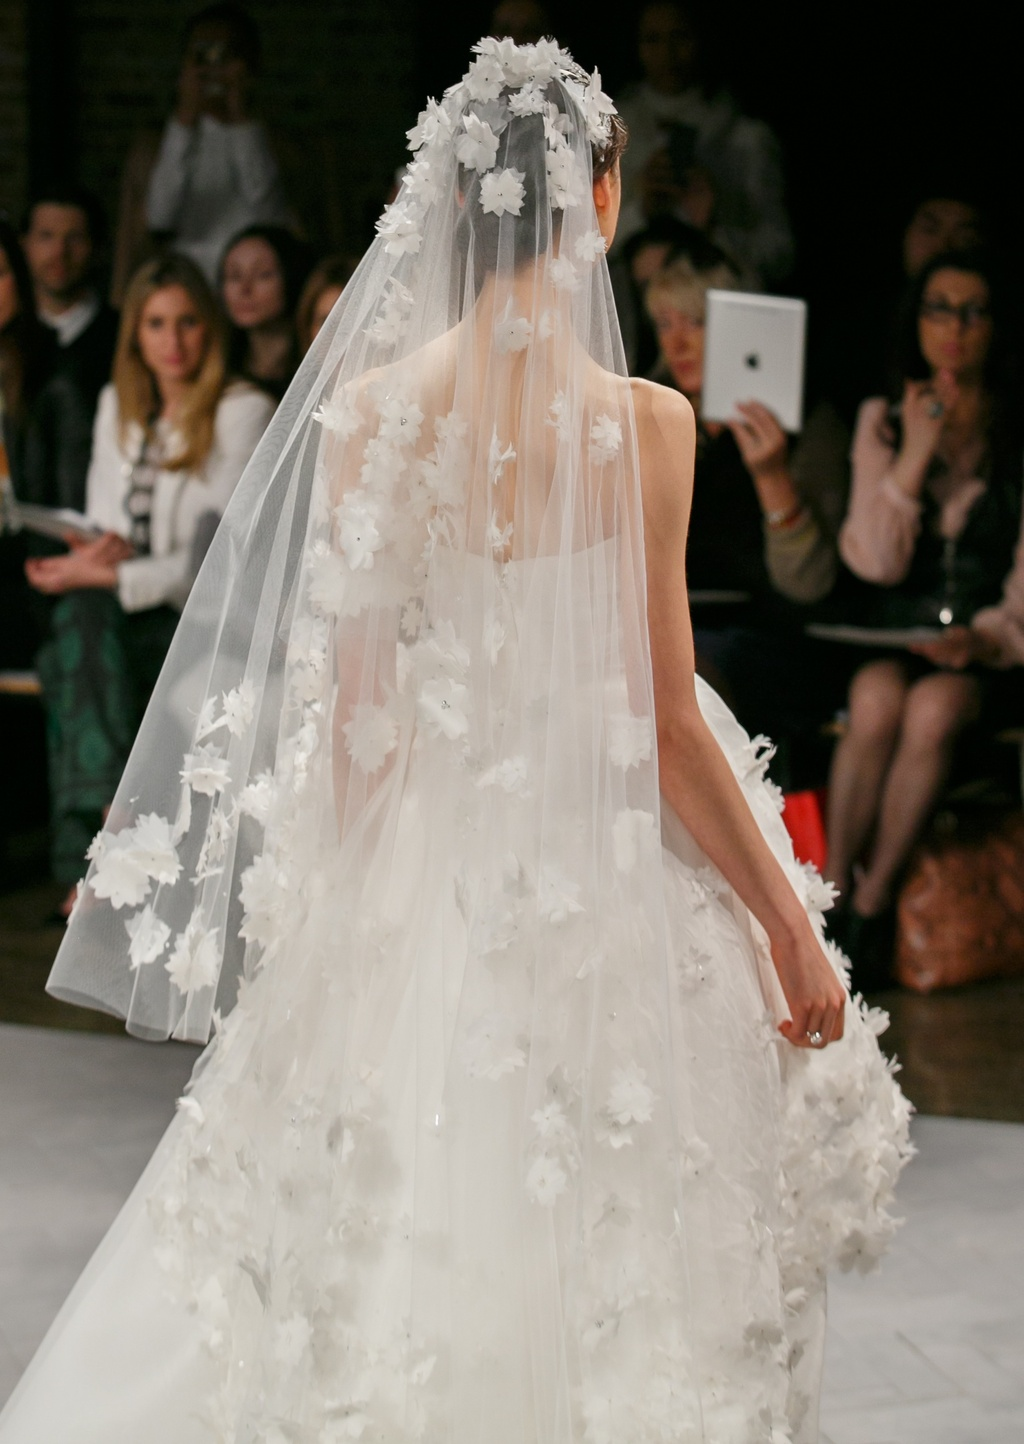 Spring-2014-wedding-dress-monique-lhuillier-bridal-pearl-veil.full